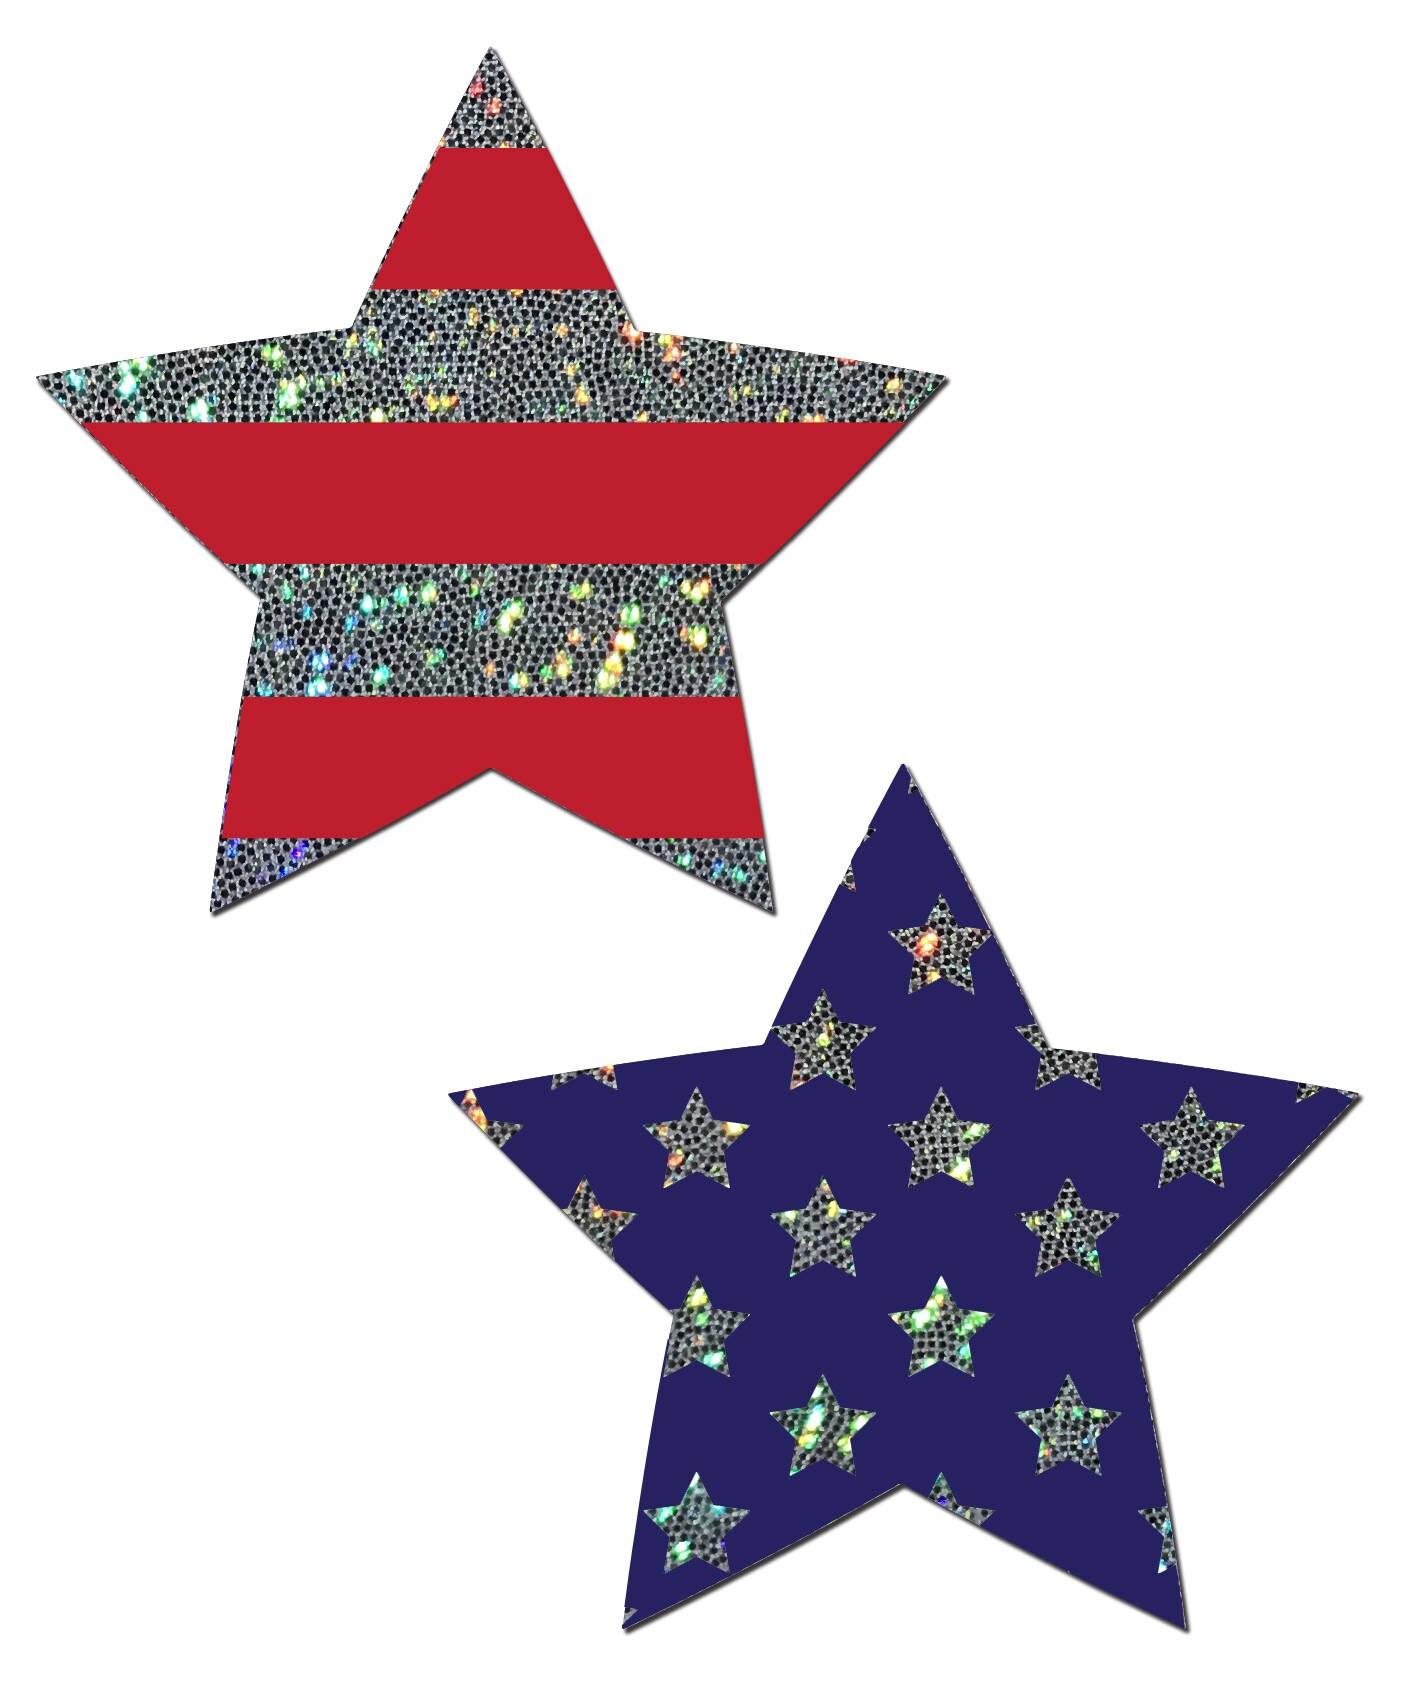 hole-hidden-hot-free-star-manalo